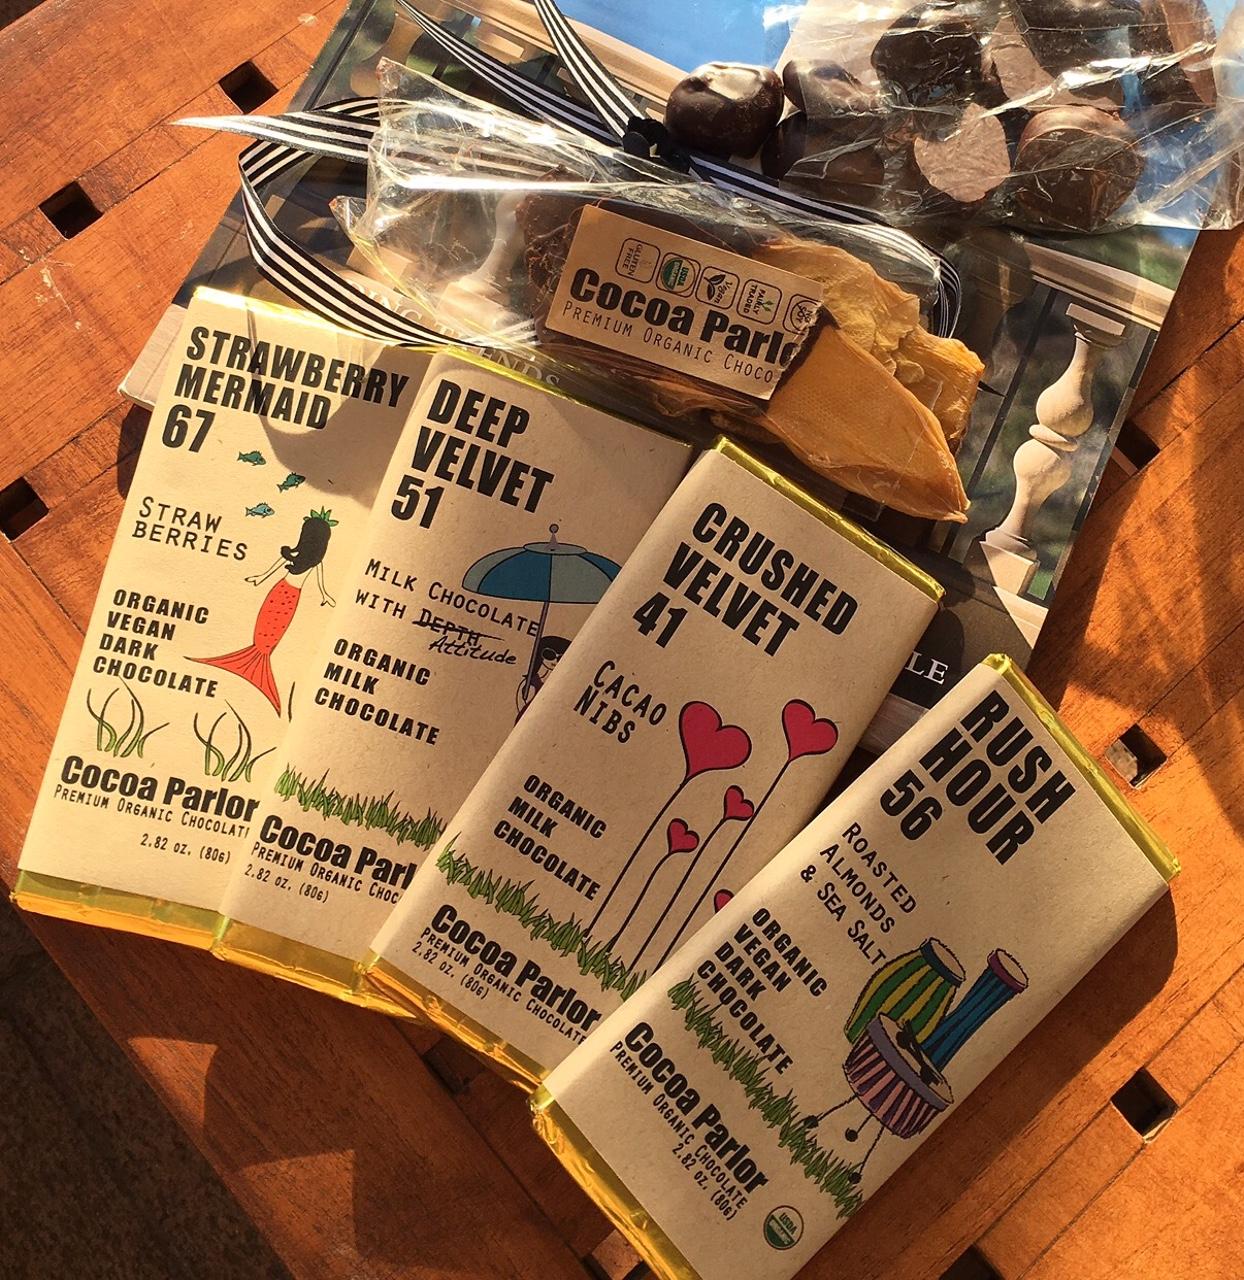 Cocoa Parlor Organic Chocolate